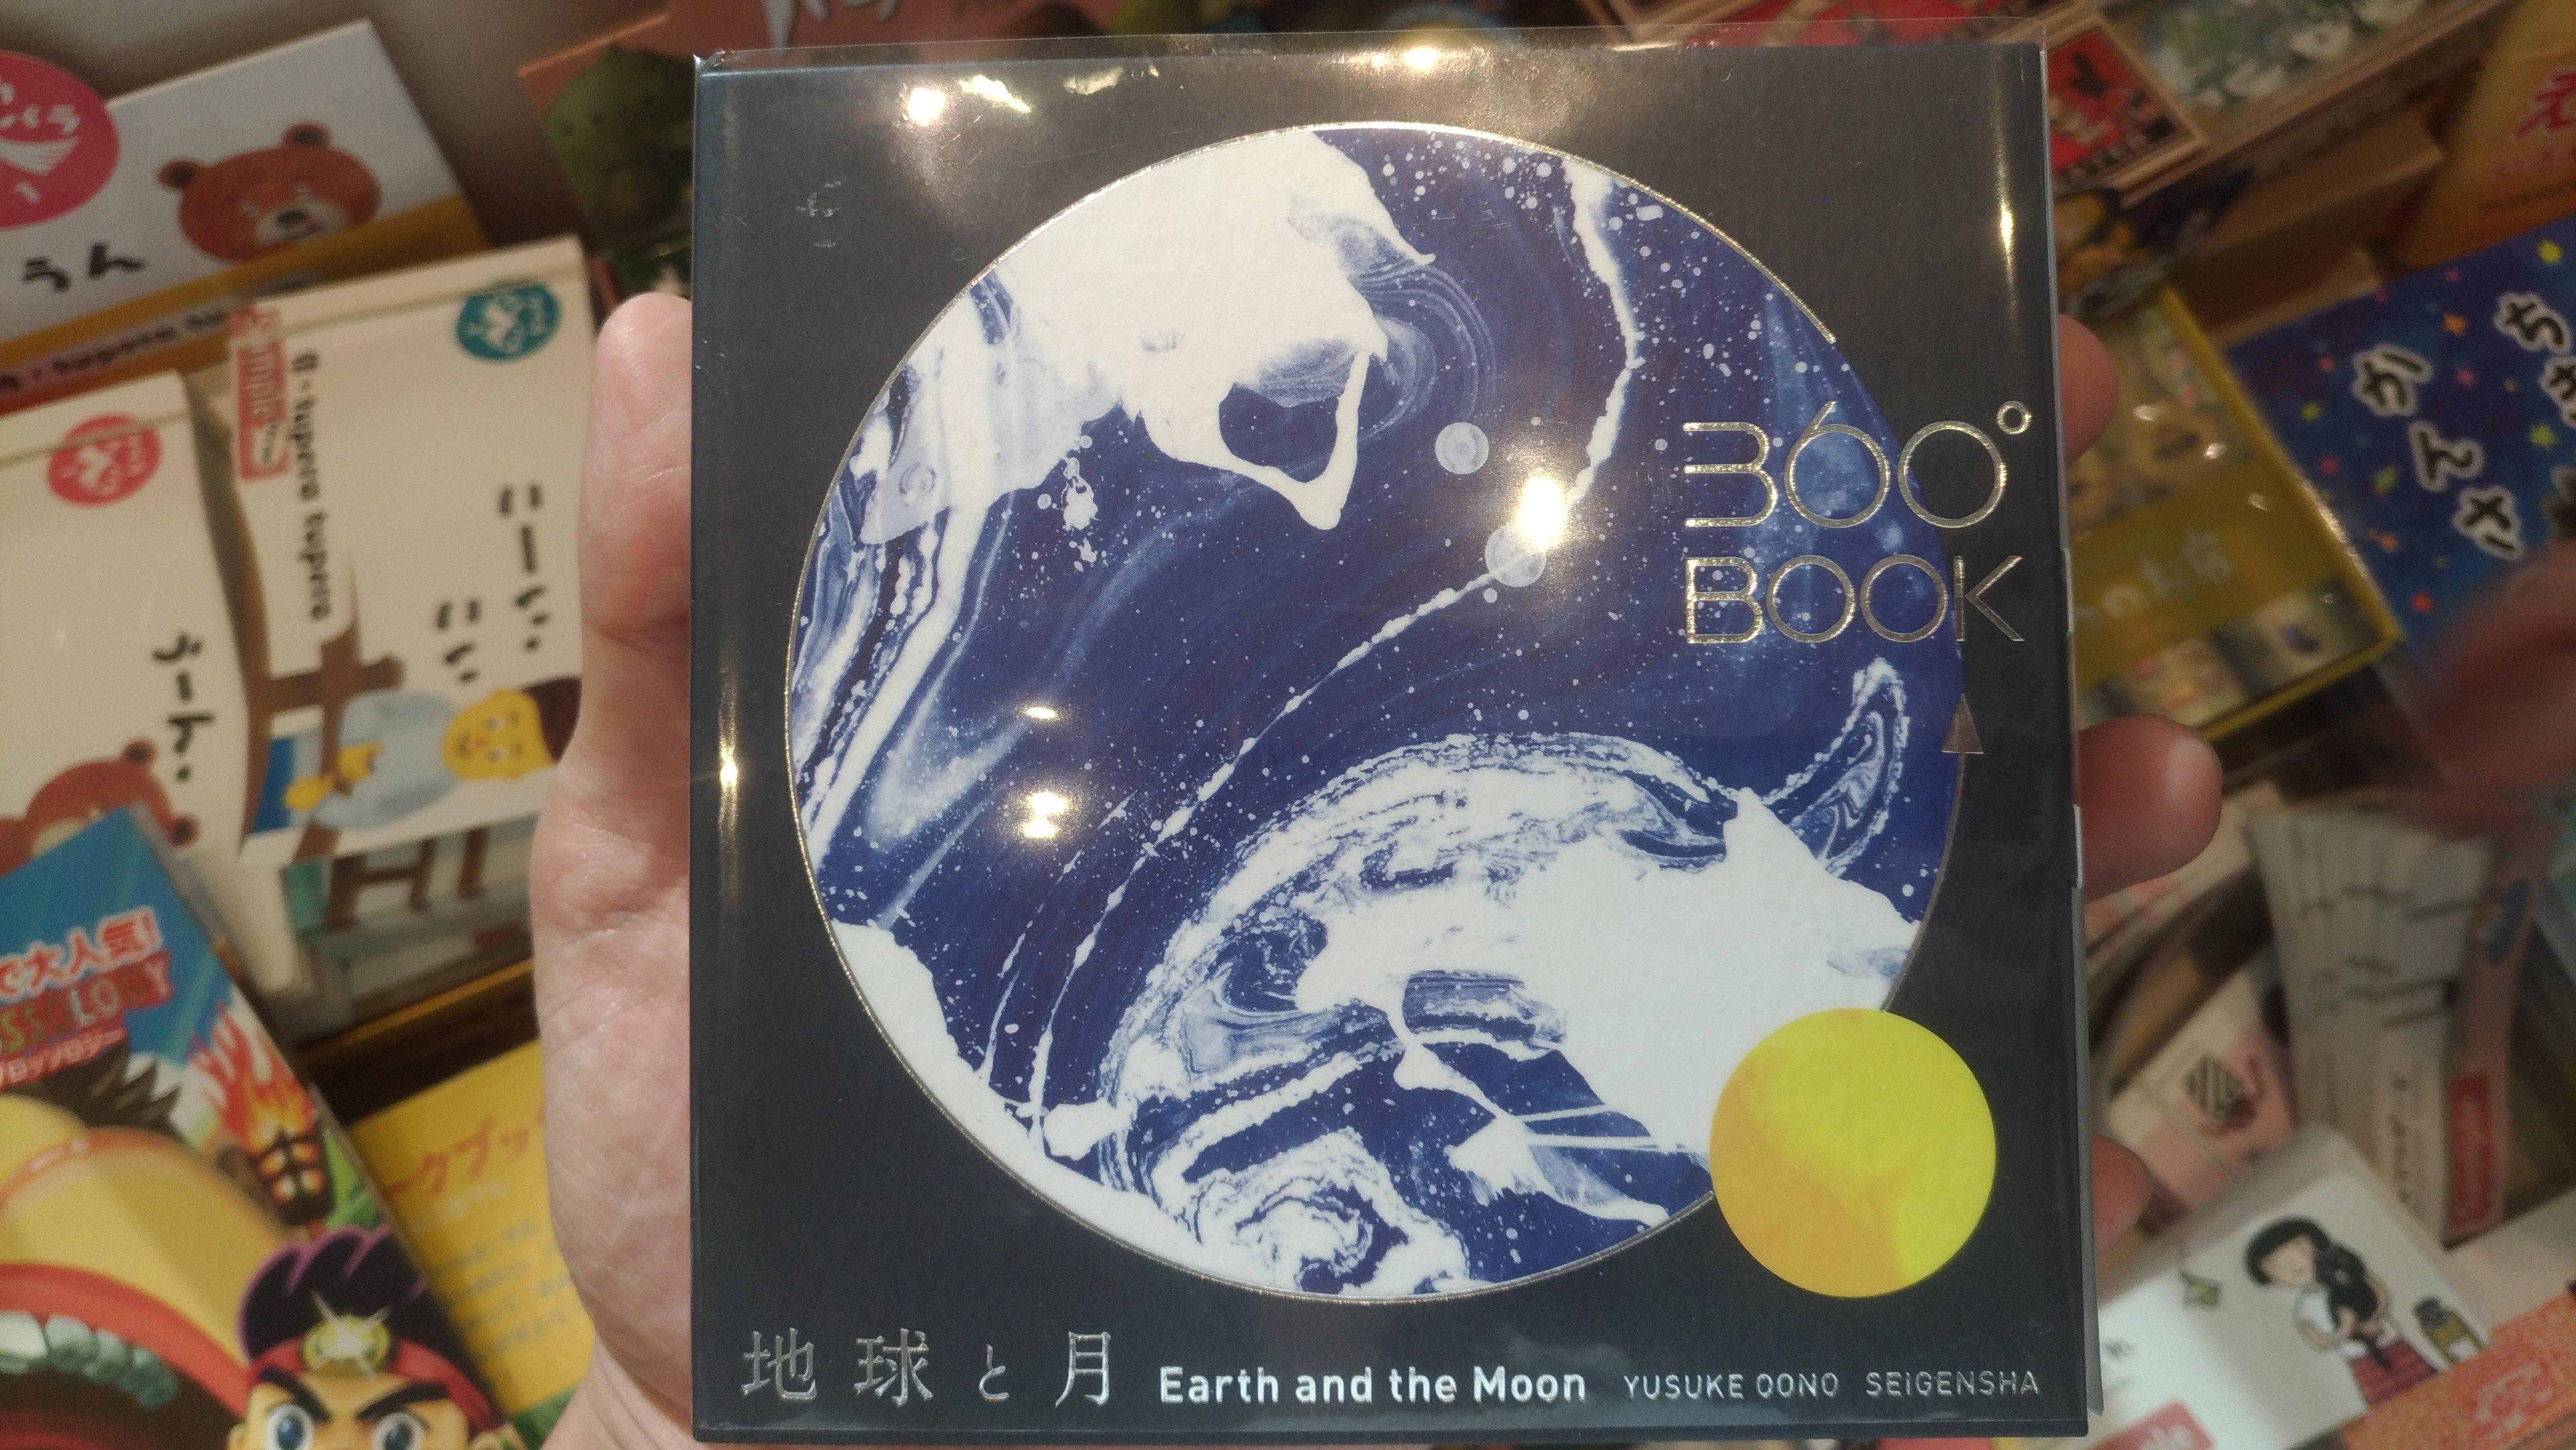 360°BOOK 地球と月